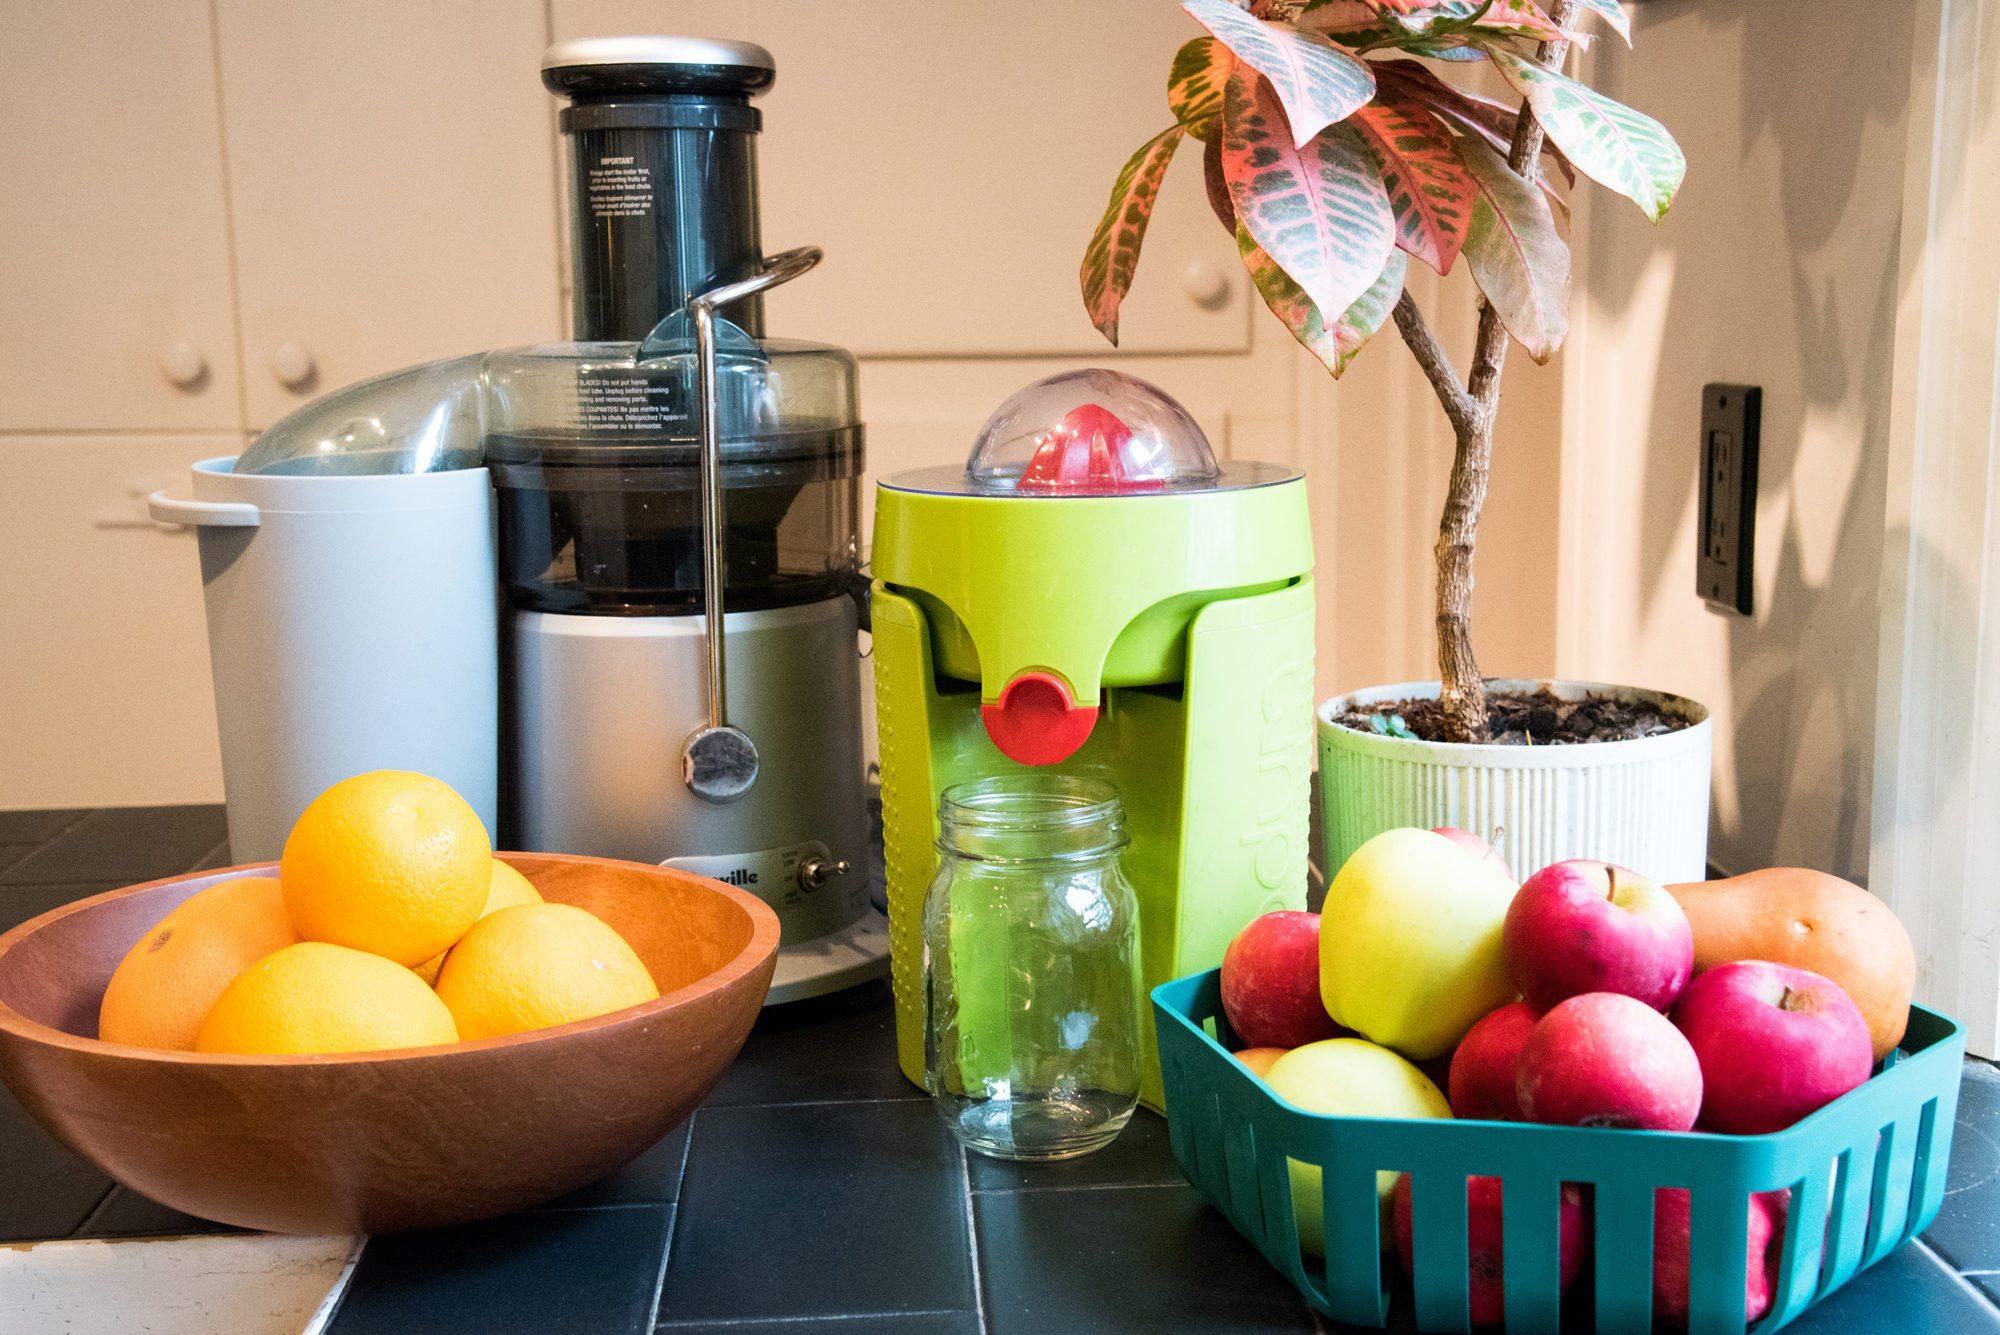 toronto-kitchen-diaries-chefs-homes-alexandra-feswick-the-drake-tools